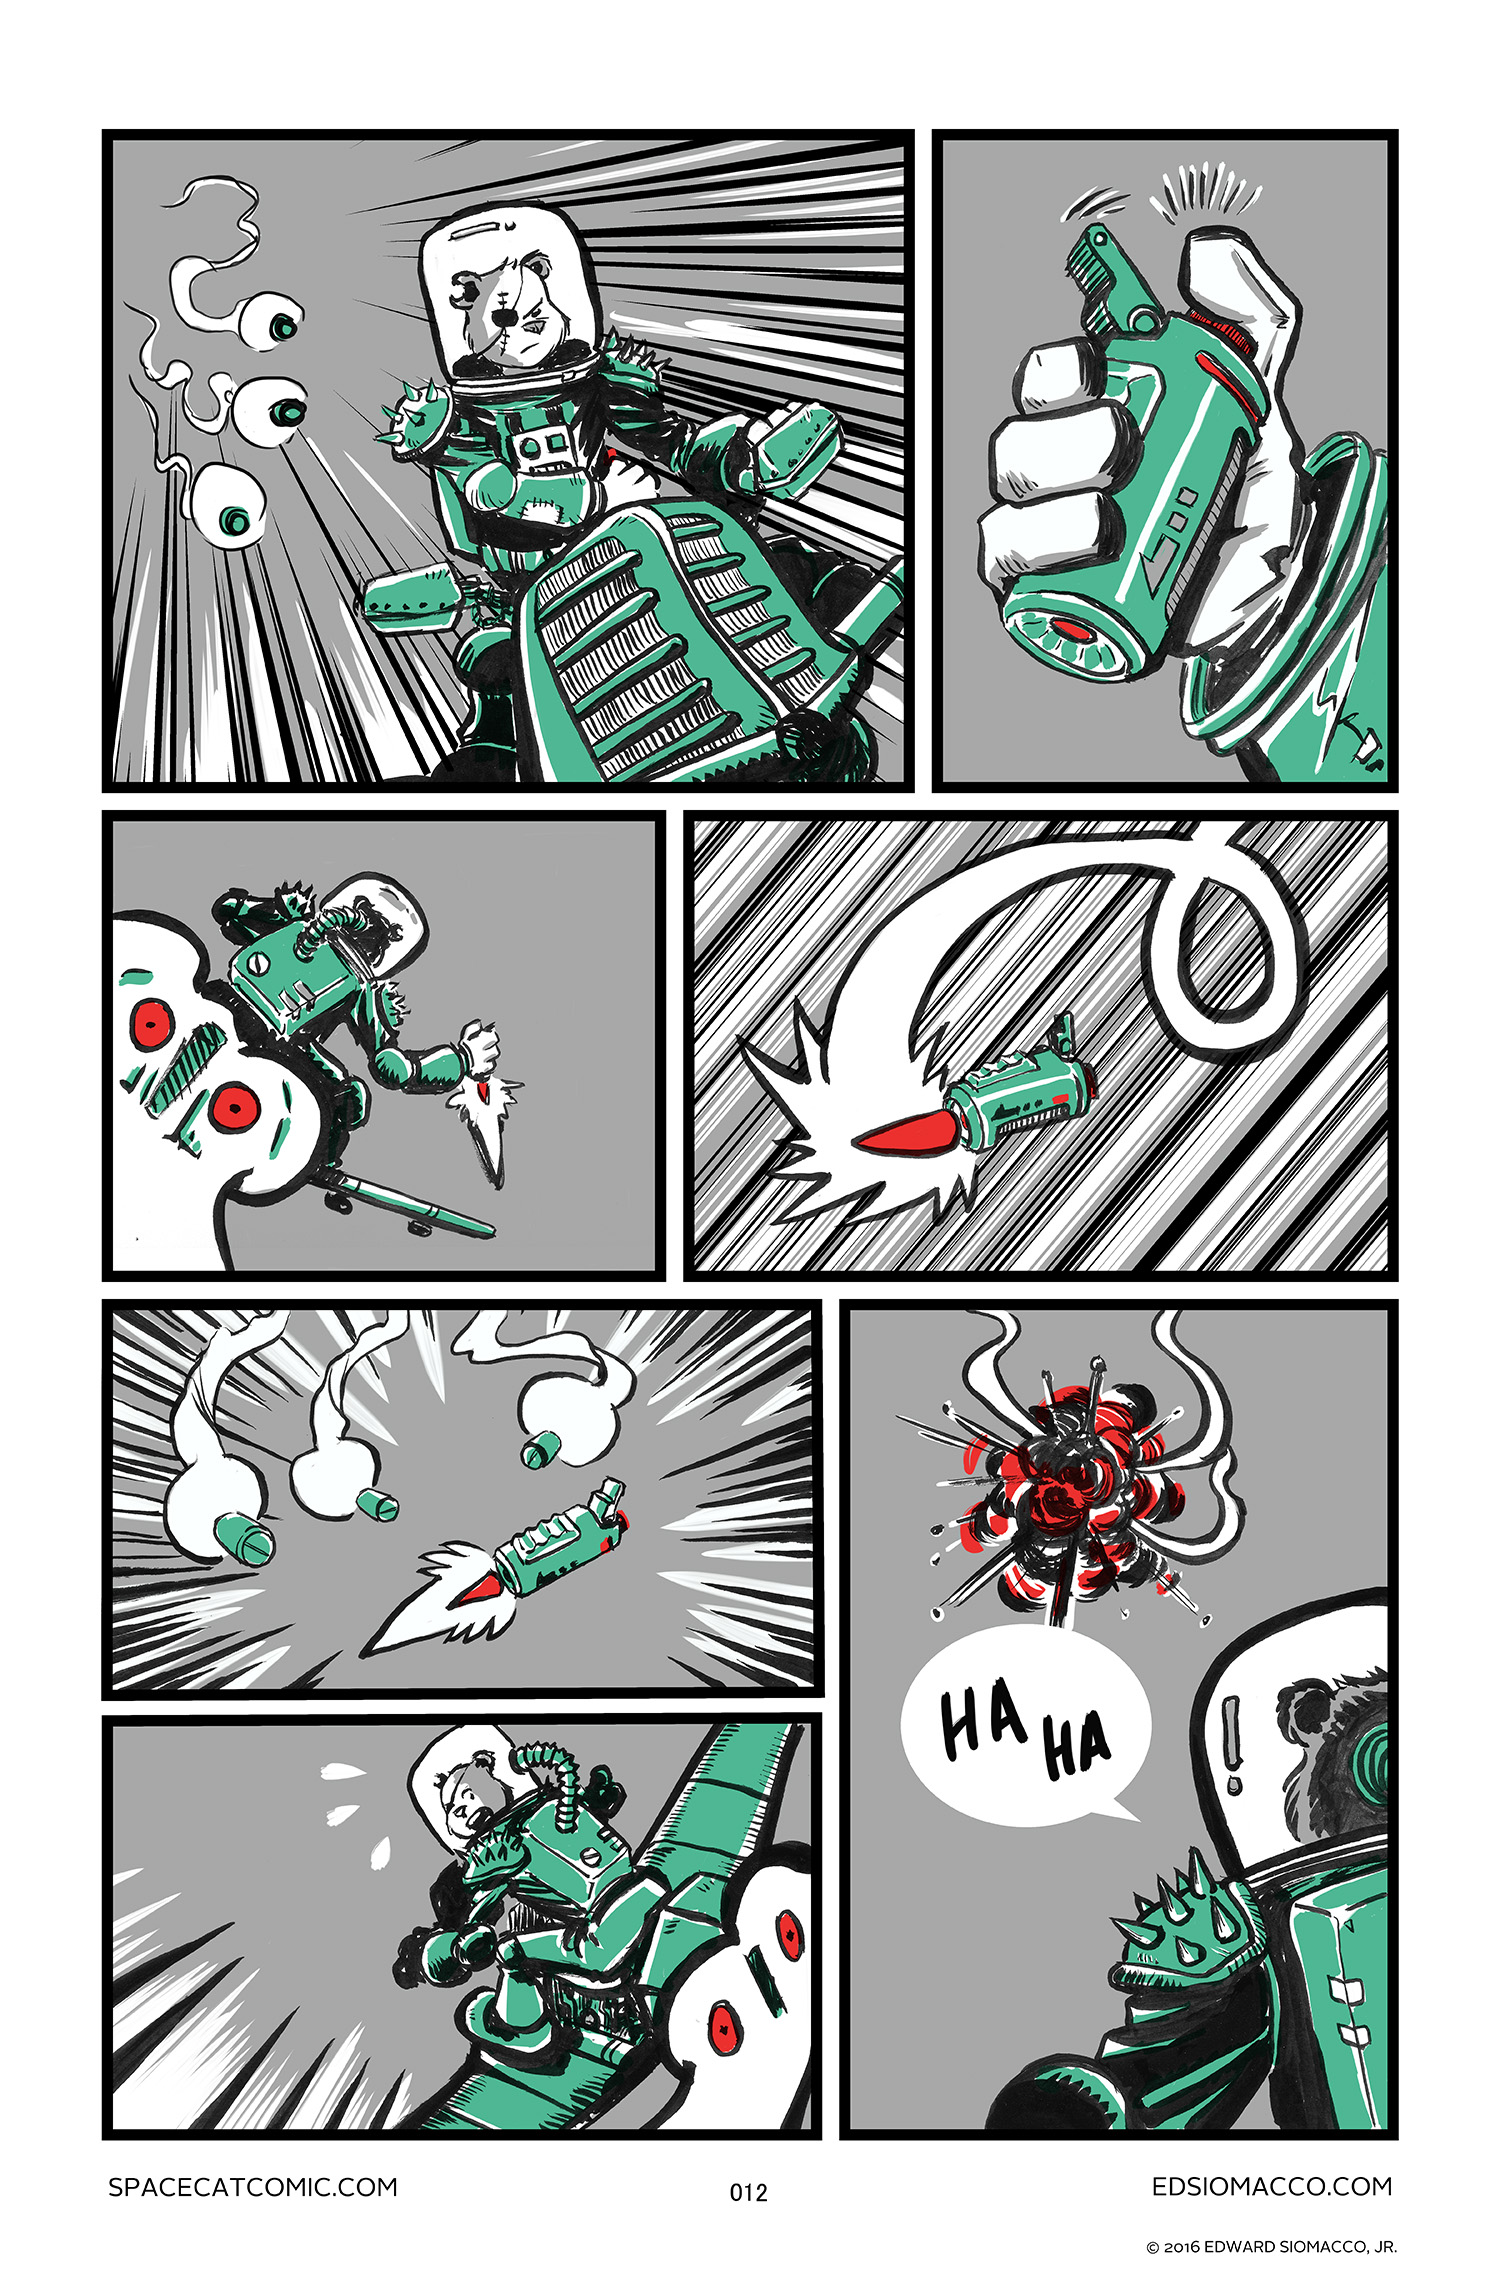 spacecat_clip_v1_012_1500